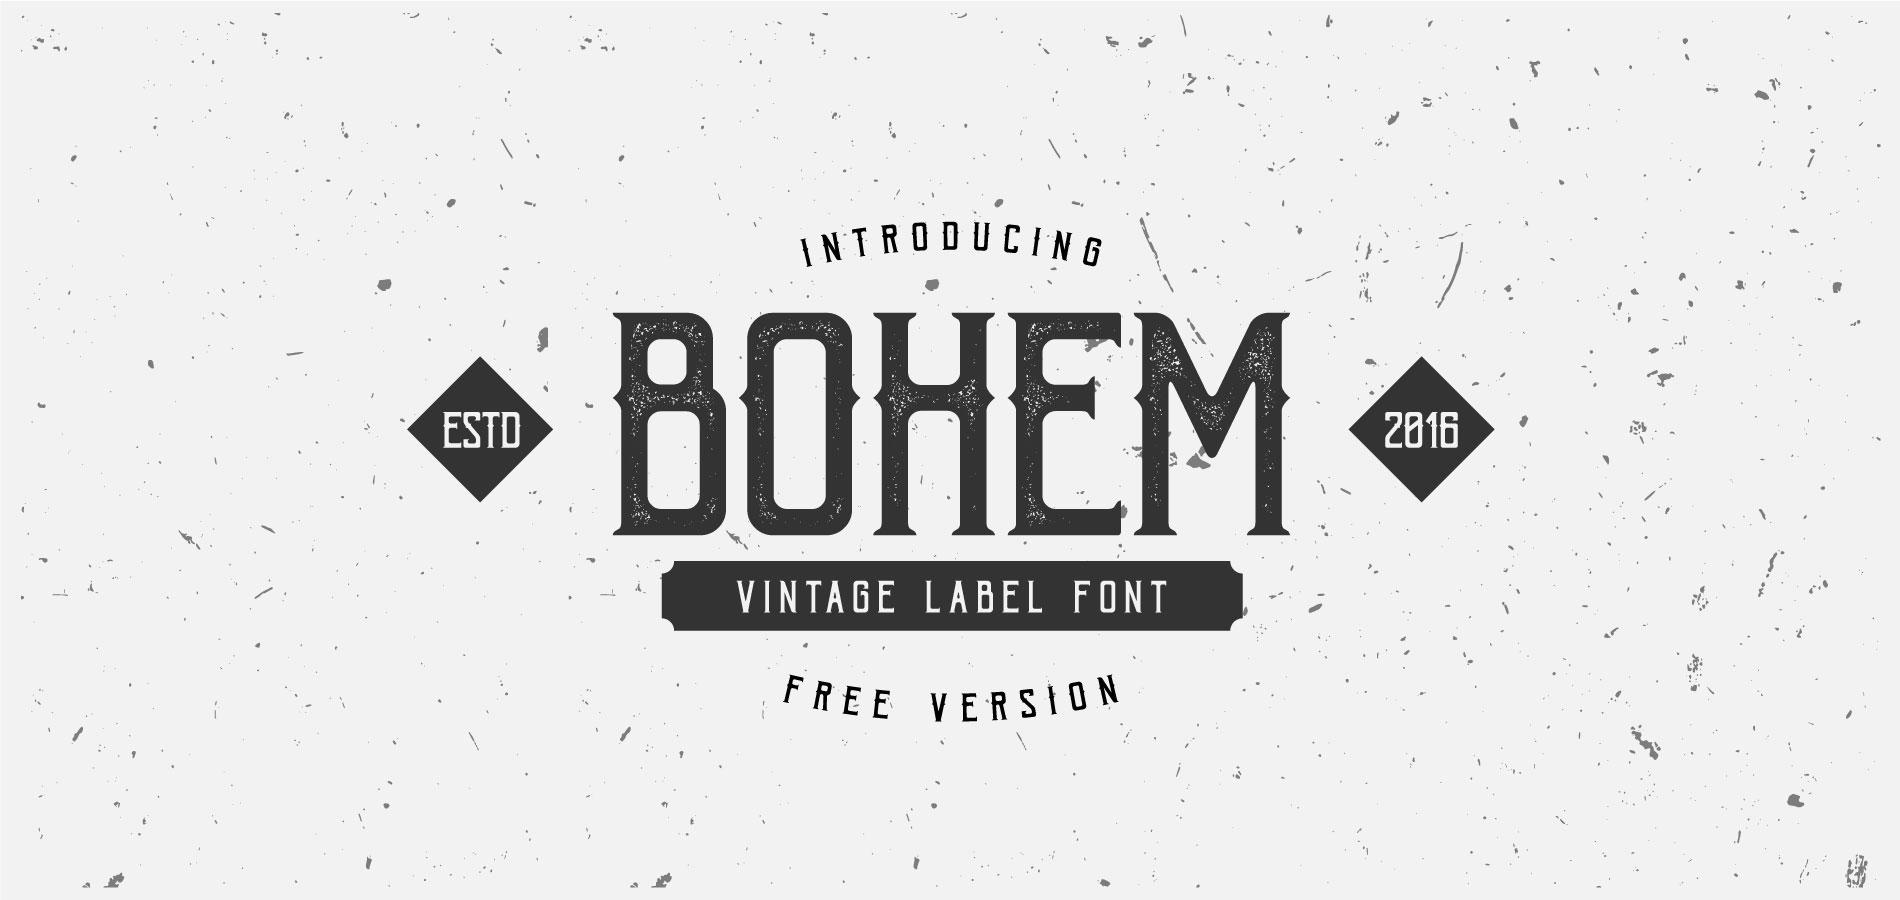 Free Download: Bohem Font